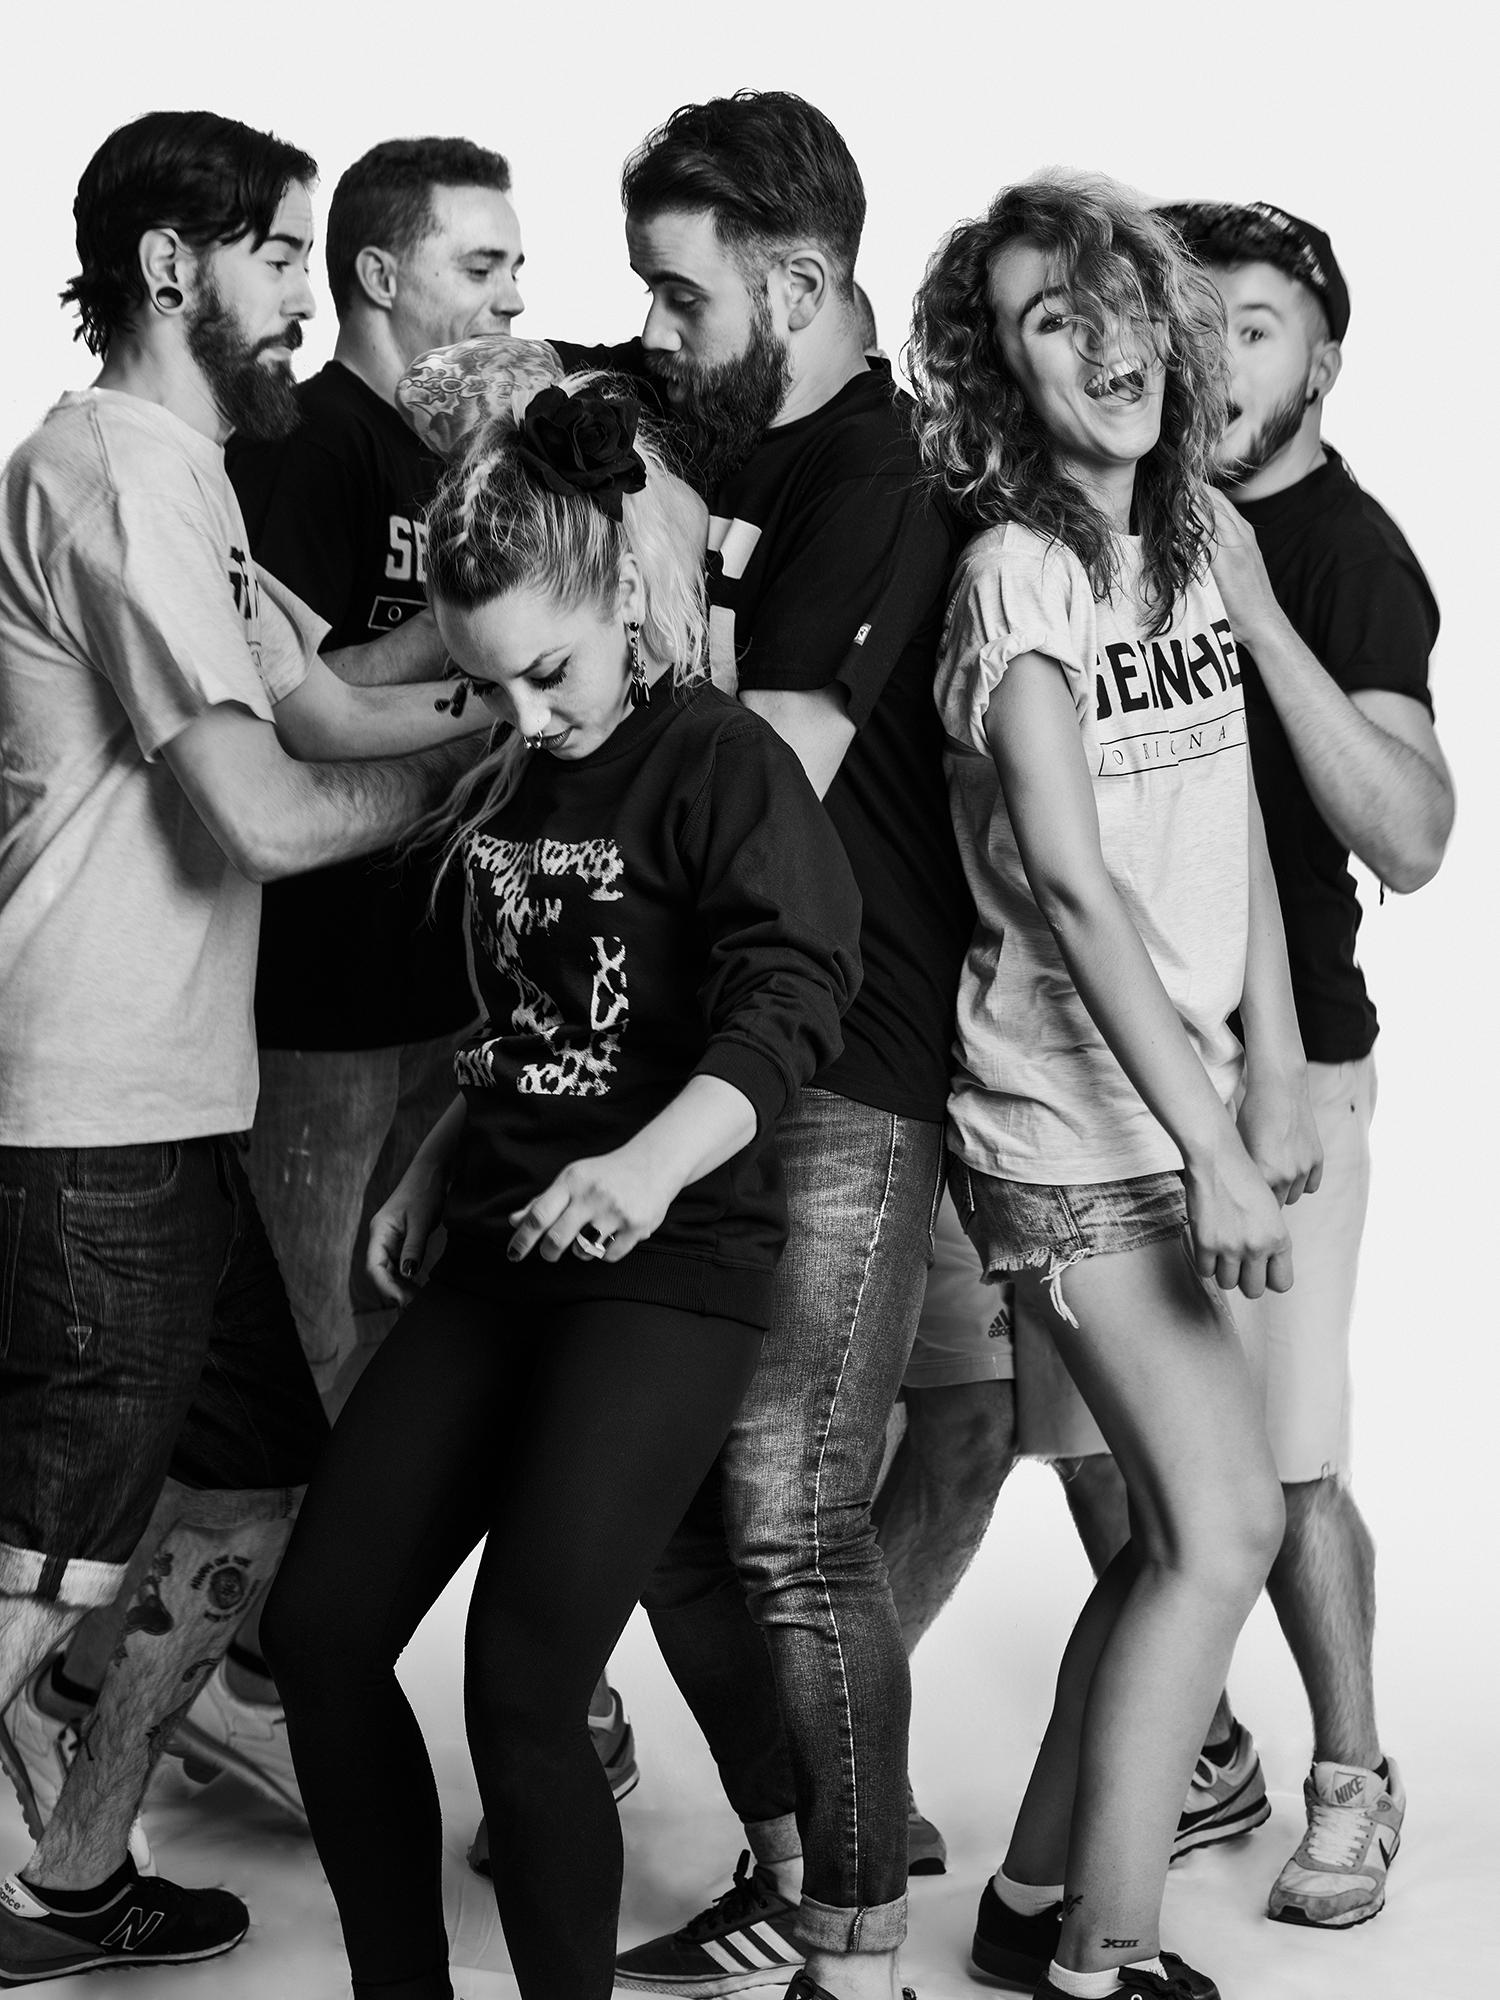 Sefinhe Crew